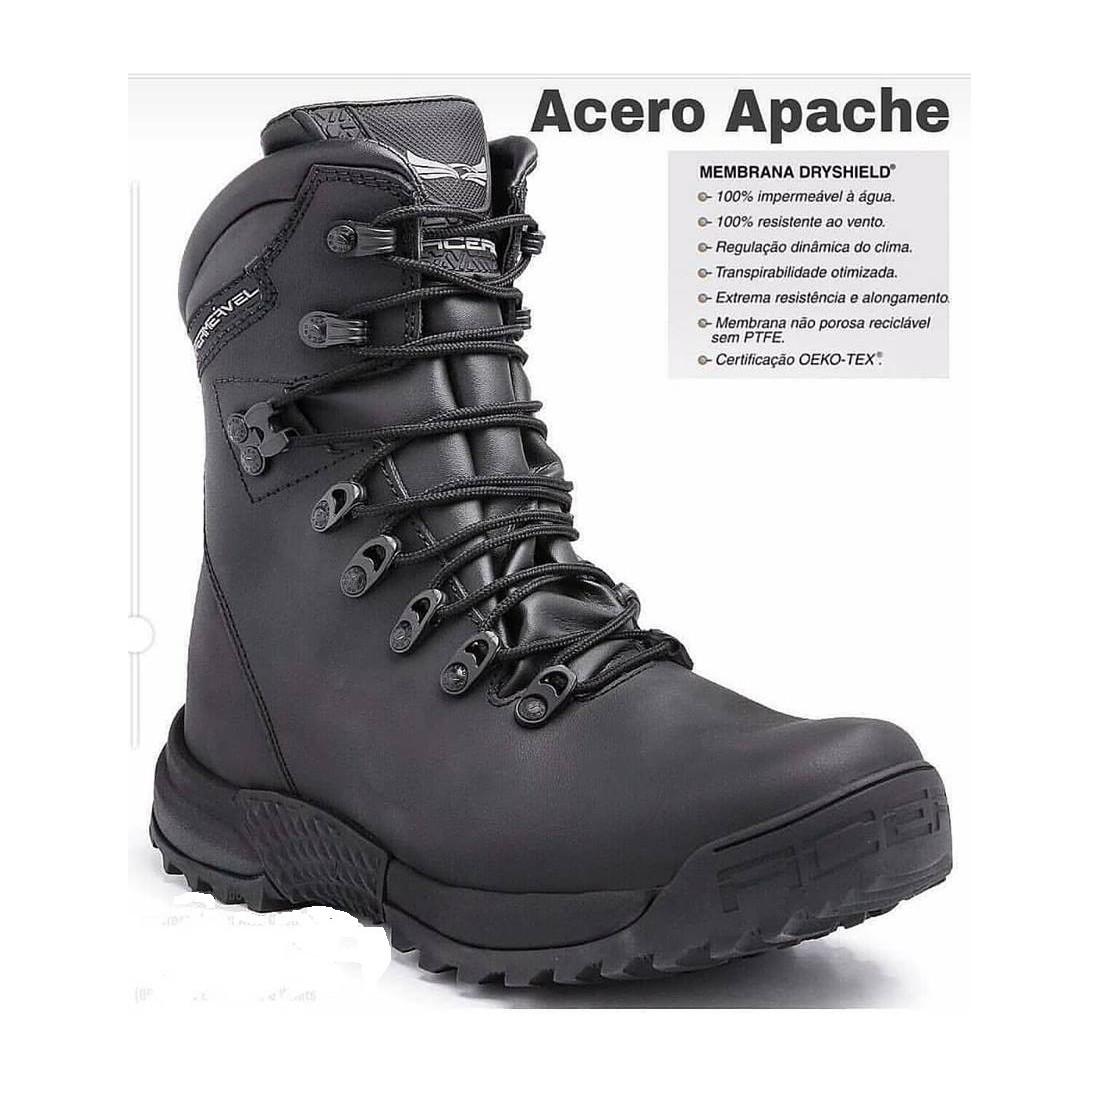 Botas Apache Dry Látego tan [Acero]